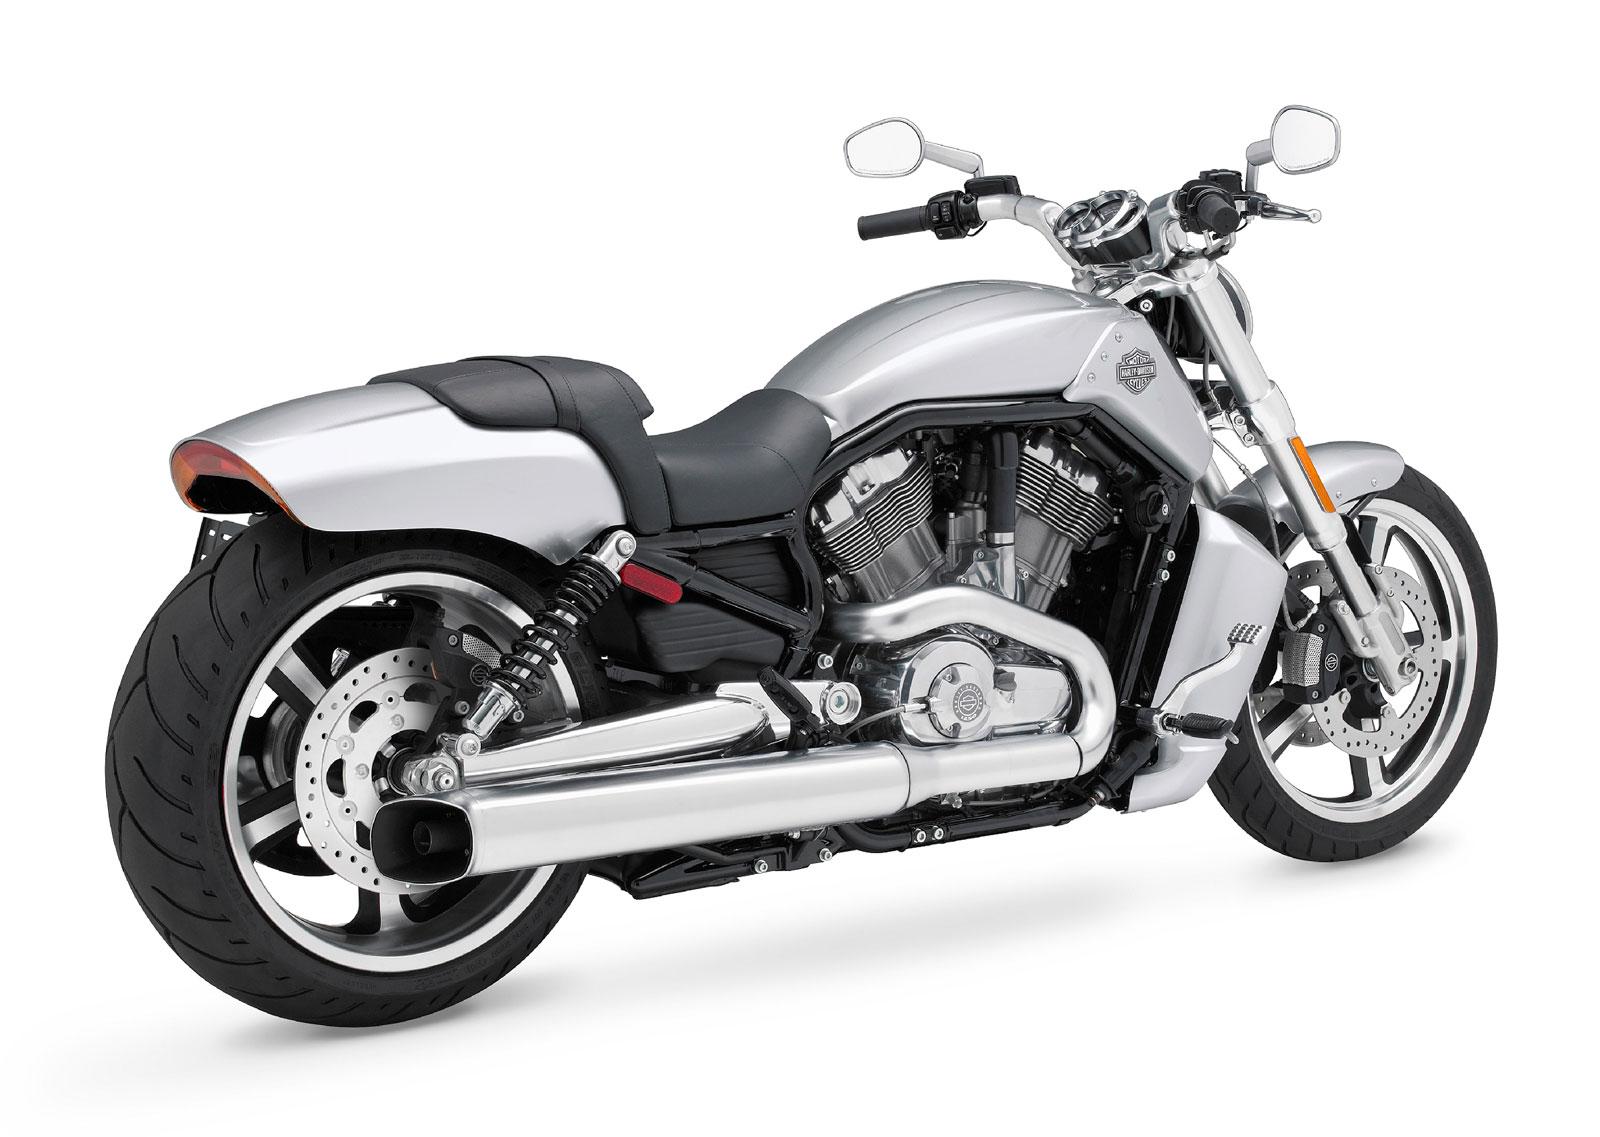 Ficha T 233 Cnica Da Harley Davidson V Rod Muscle Vrscf 2009 A